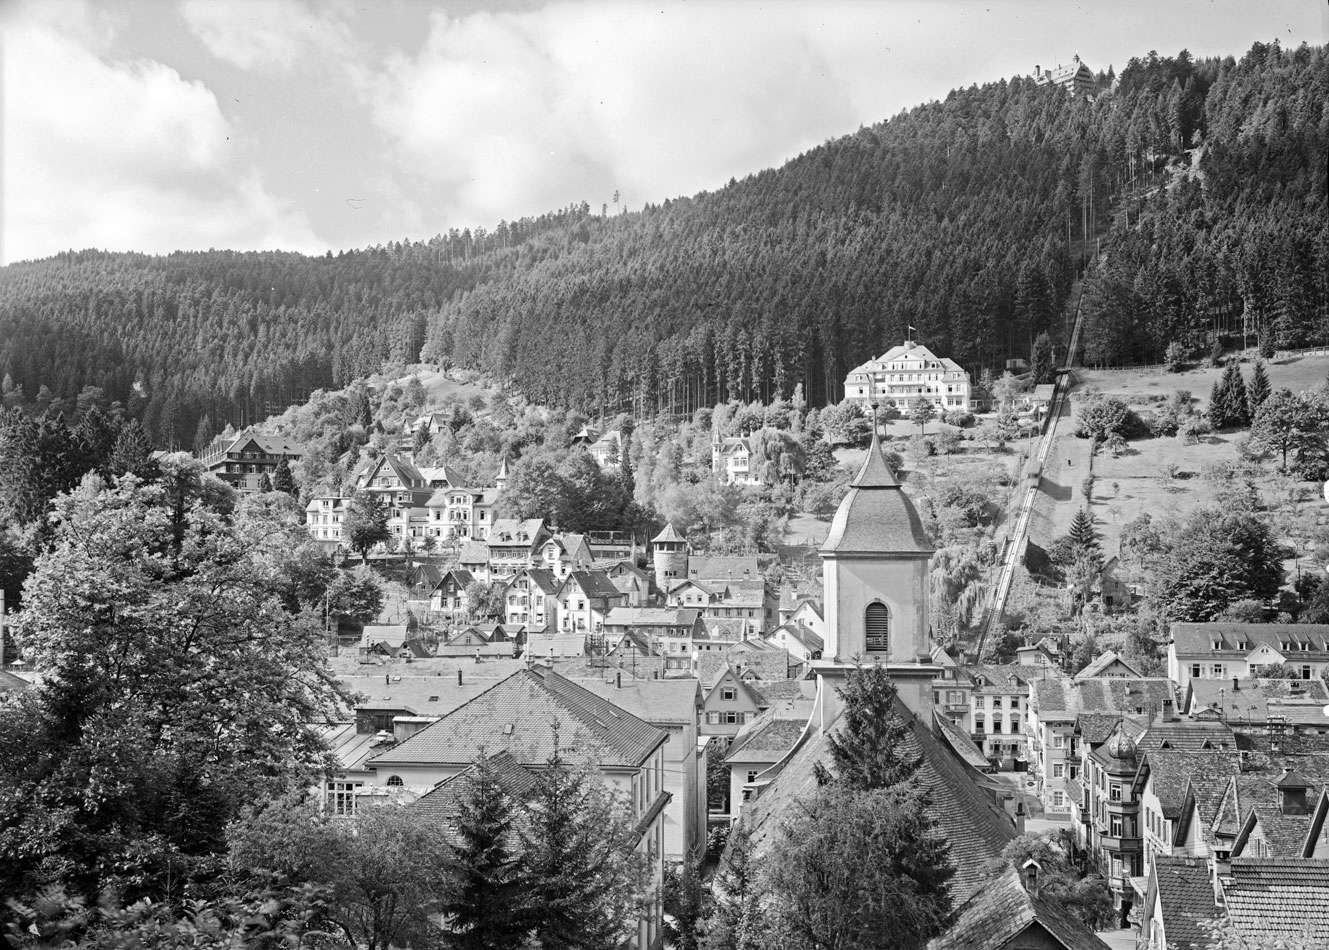 Dokumentation Wildbad und Calmbach, Nr 003